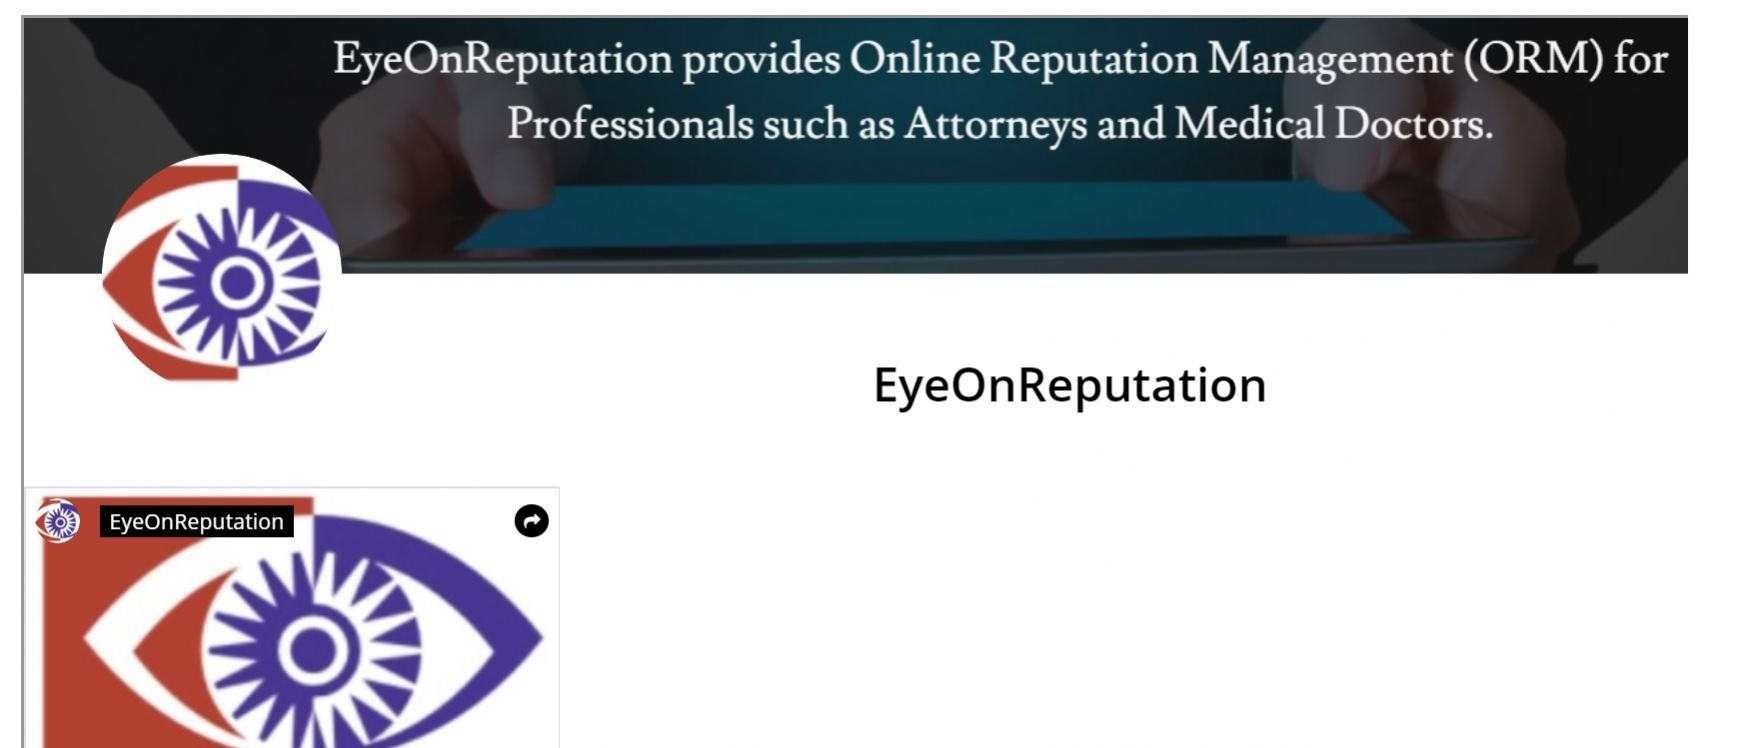 News about EyeOnReputation